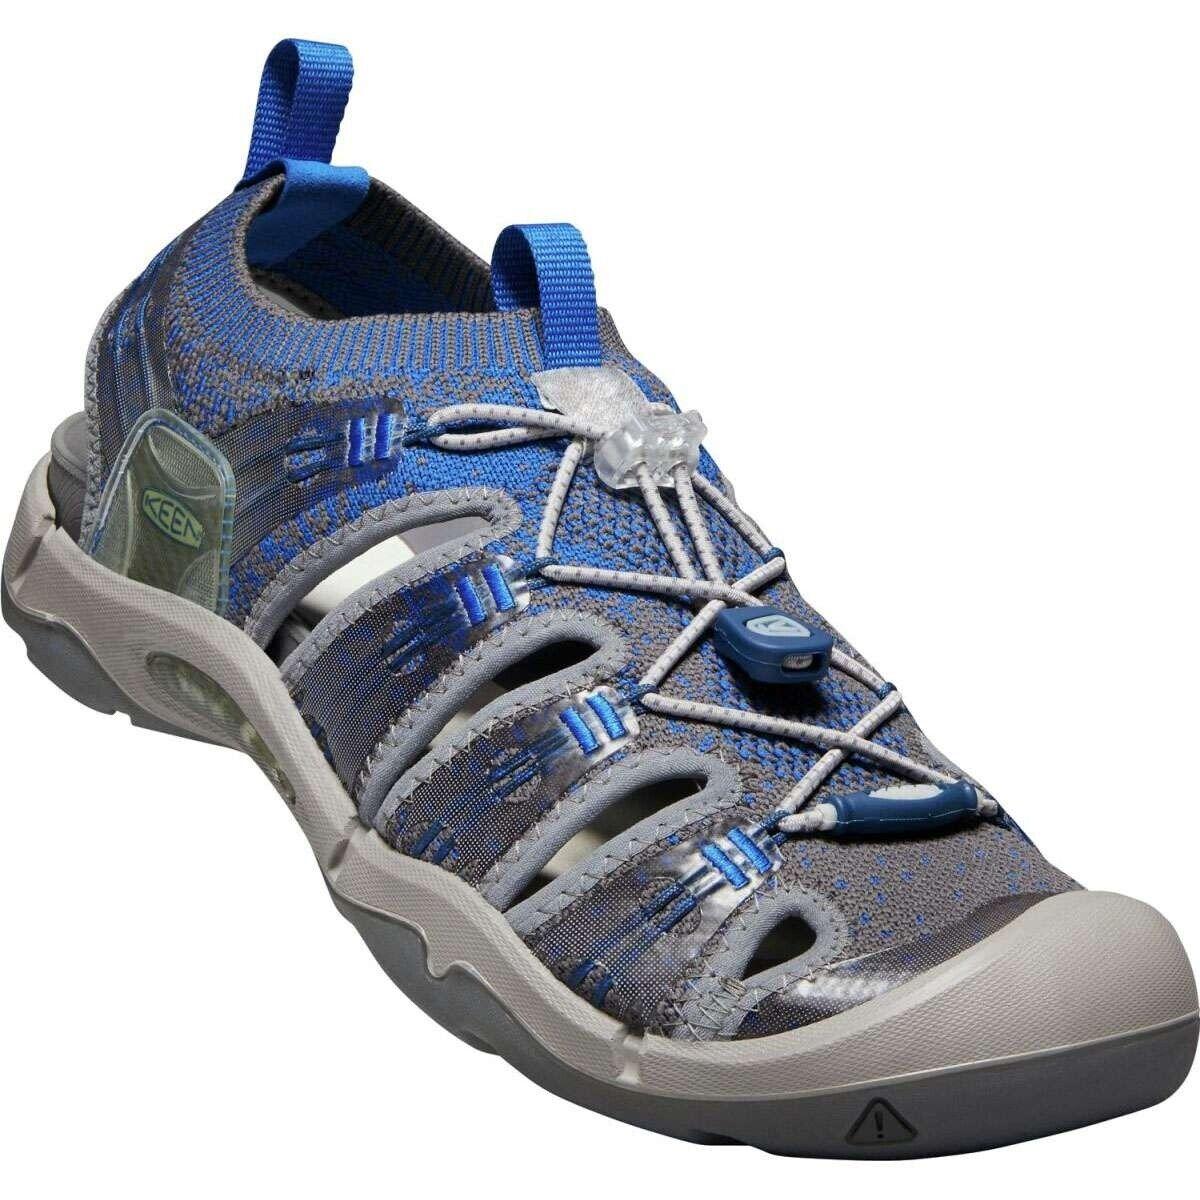 Keen evofit 1 sandalias azul